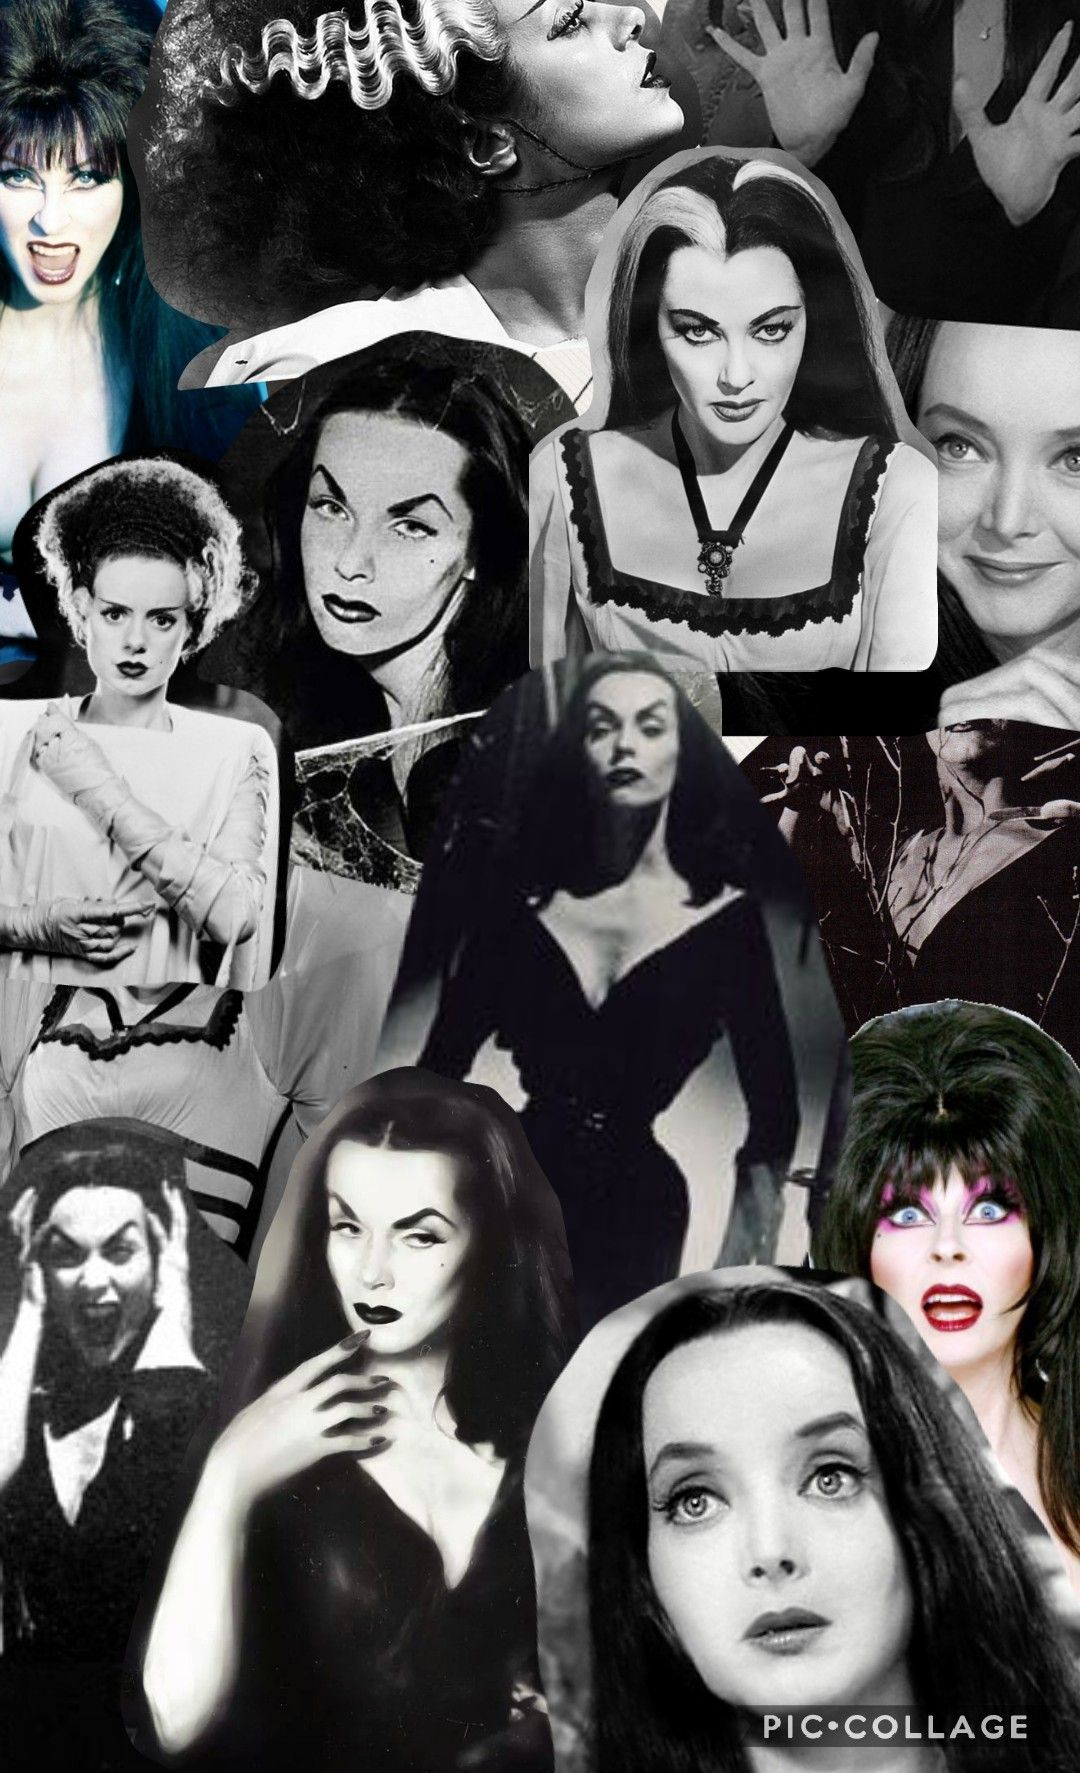 By Me Cannibal Grrrl Insta Creepygirls Wallpaper Morticiaaddams Elvira Vampira Frankensteinsbride Goth Wallpaper Halloween Wallpaper Classic Horror